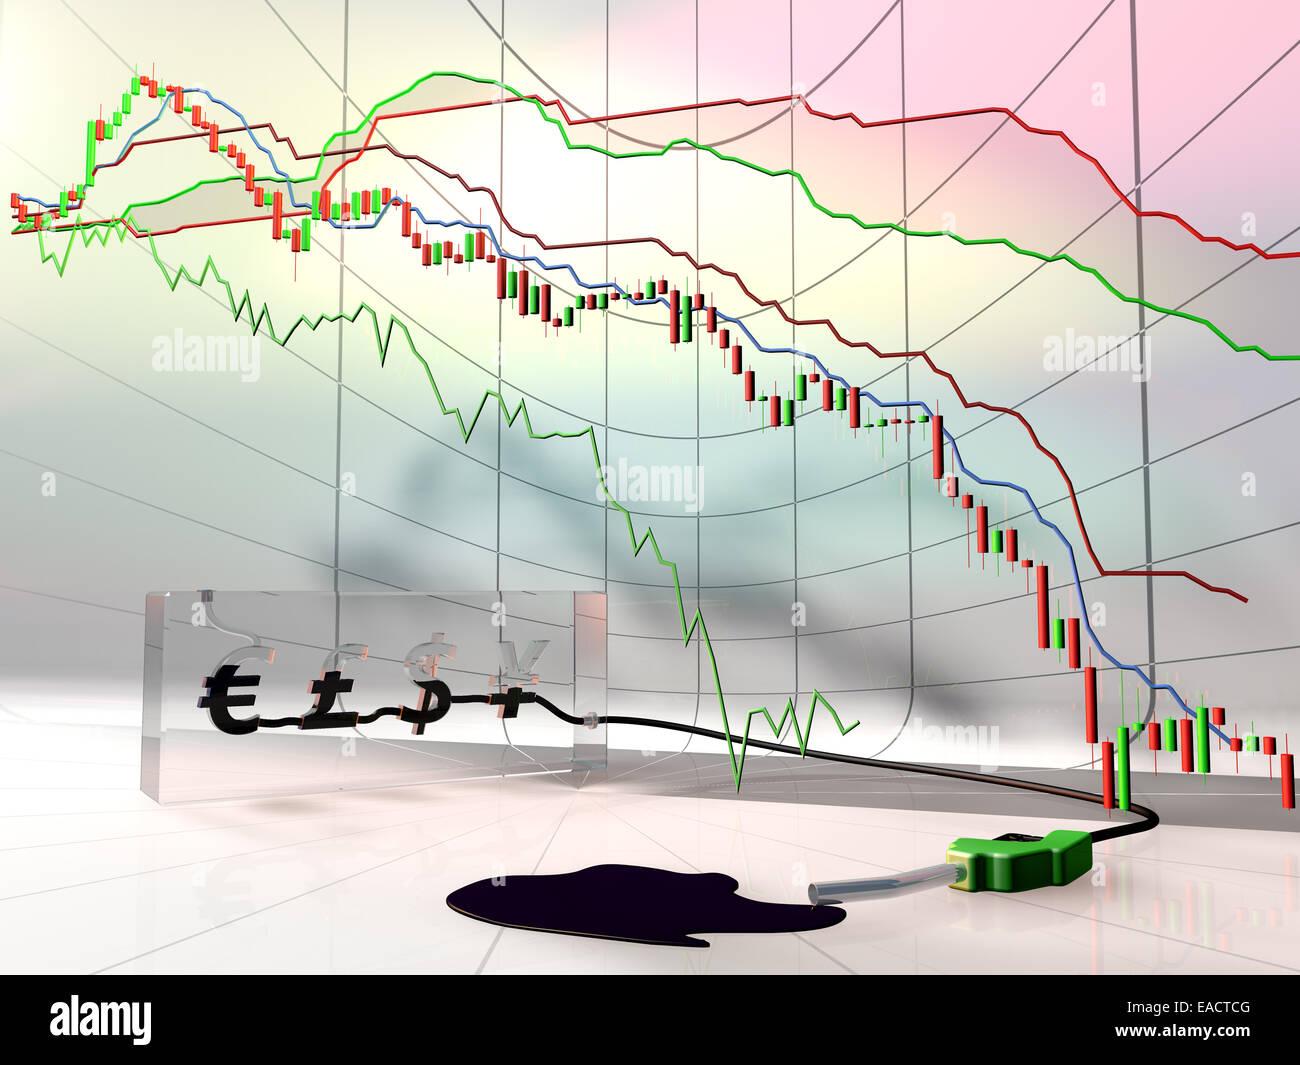 Conceptual oil chart dropdown. - Stock Image